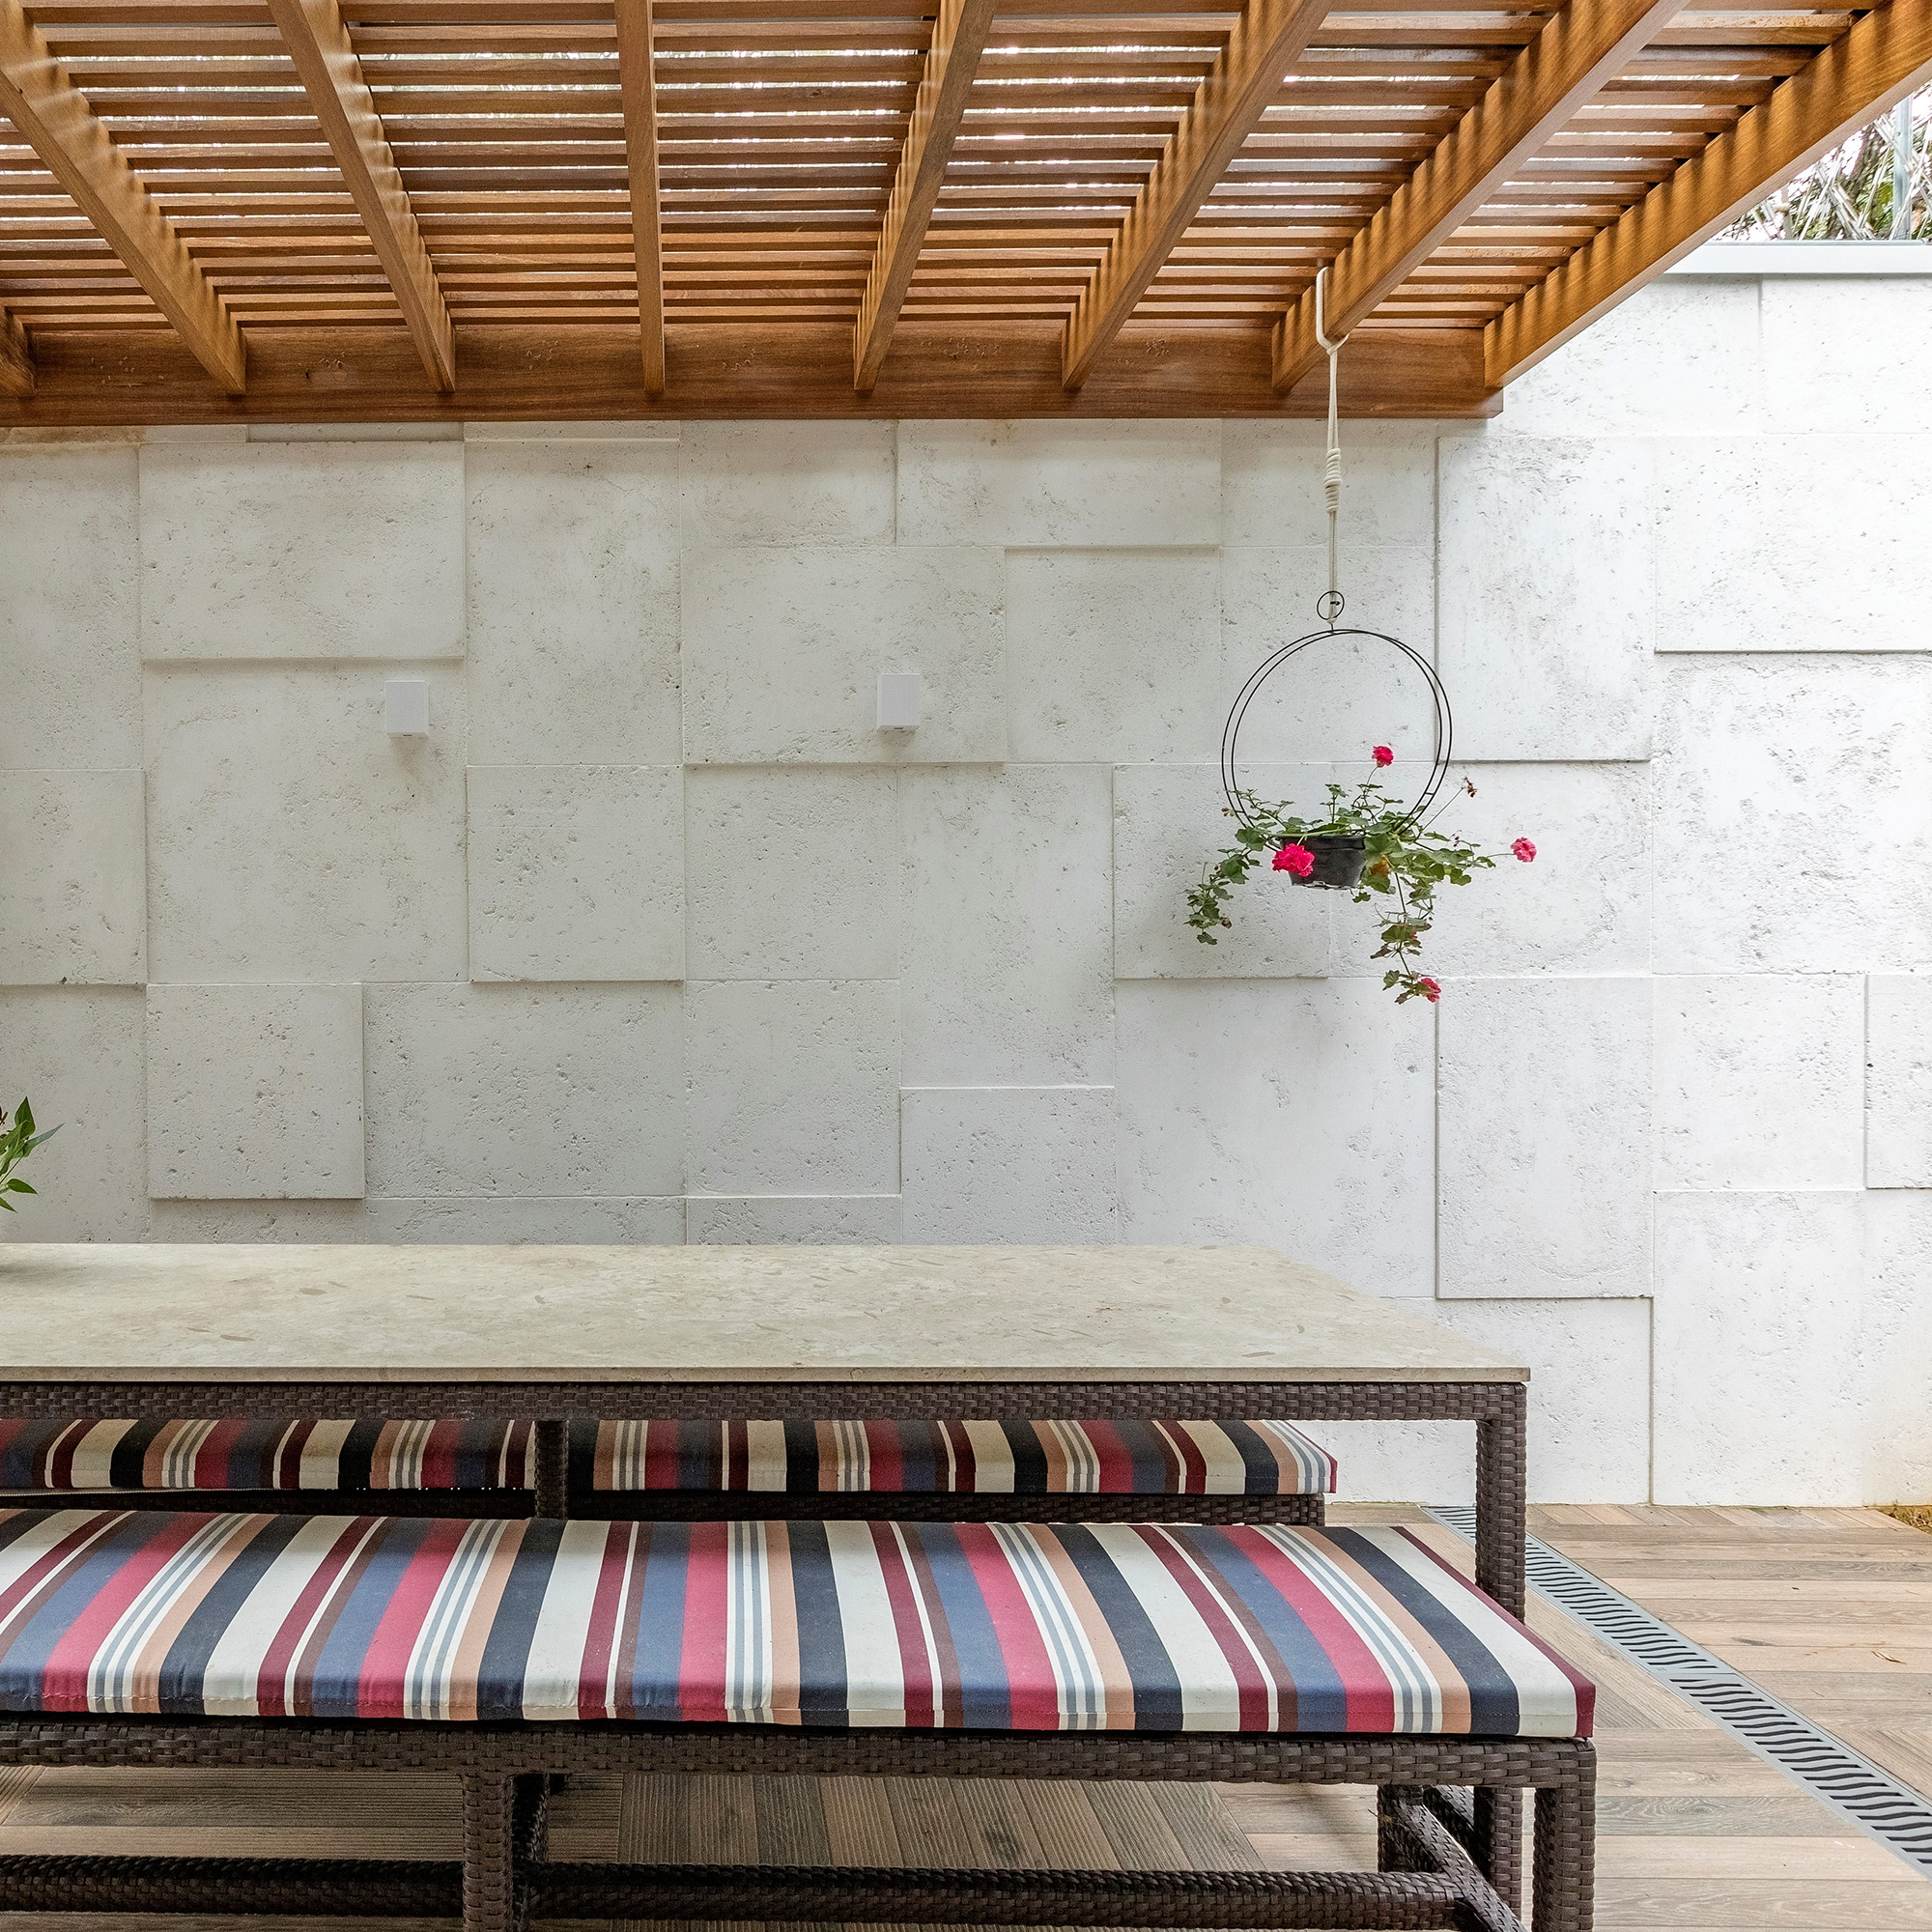 Etrusco Branco - Arquiteta Raquel Miyatake